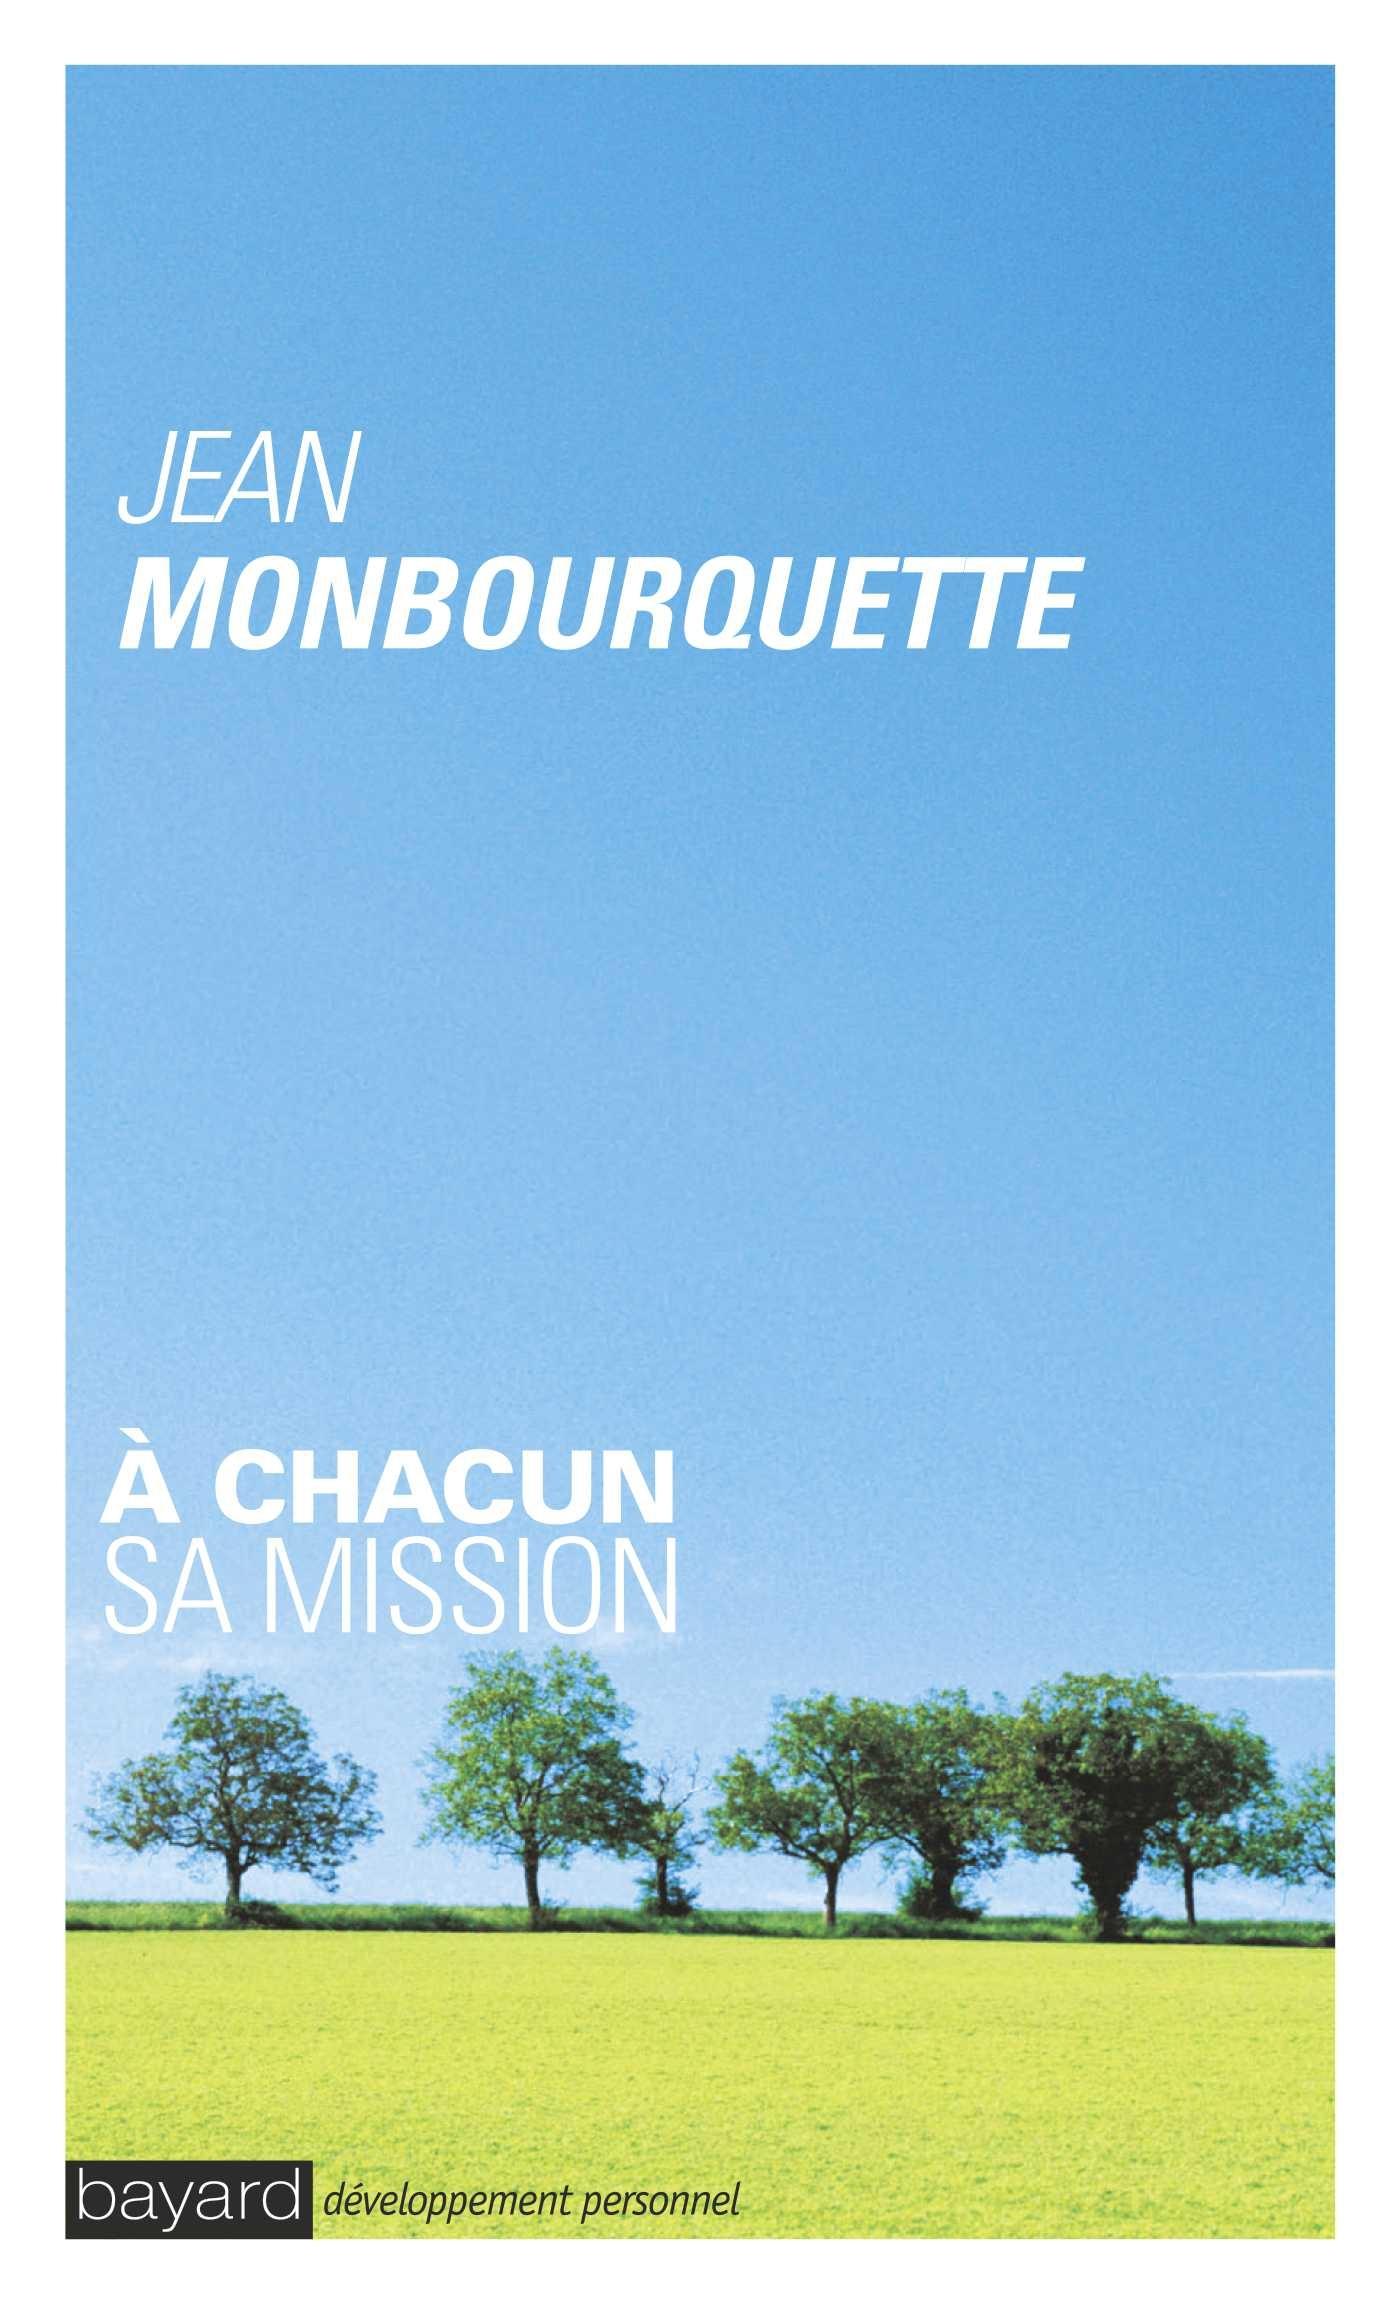 A CHACUN SA MISSION